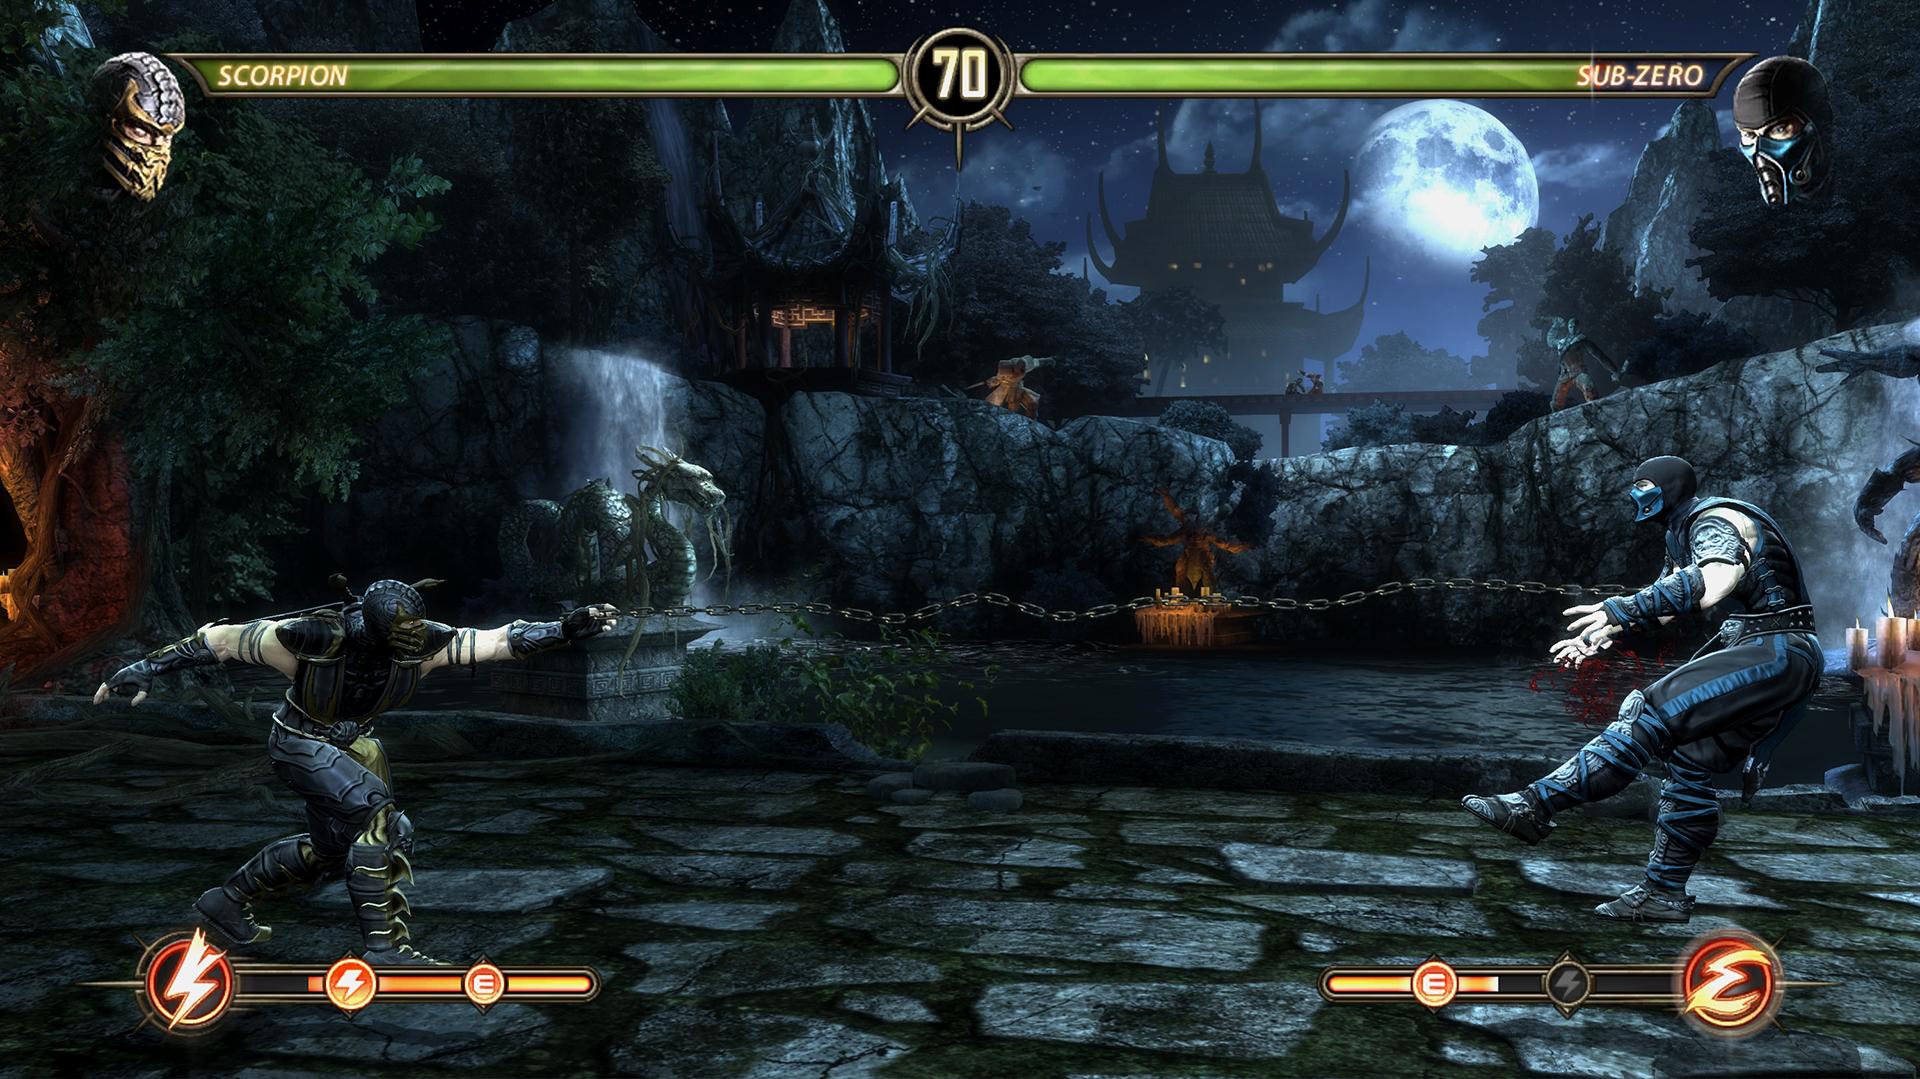 mortal kombat 9 pc game highly compressed